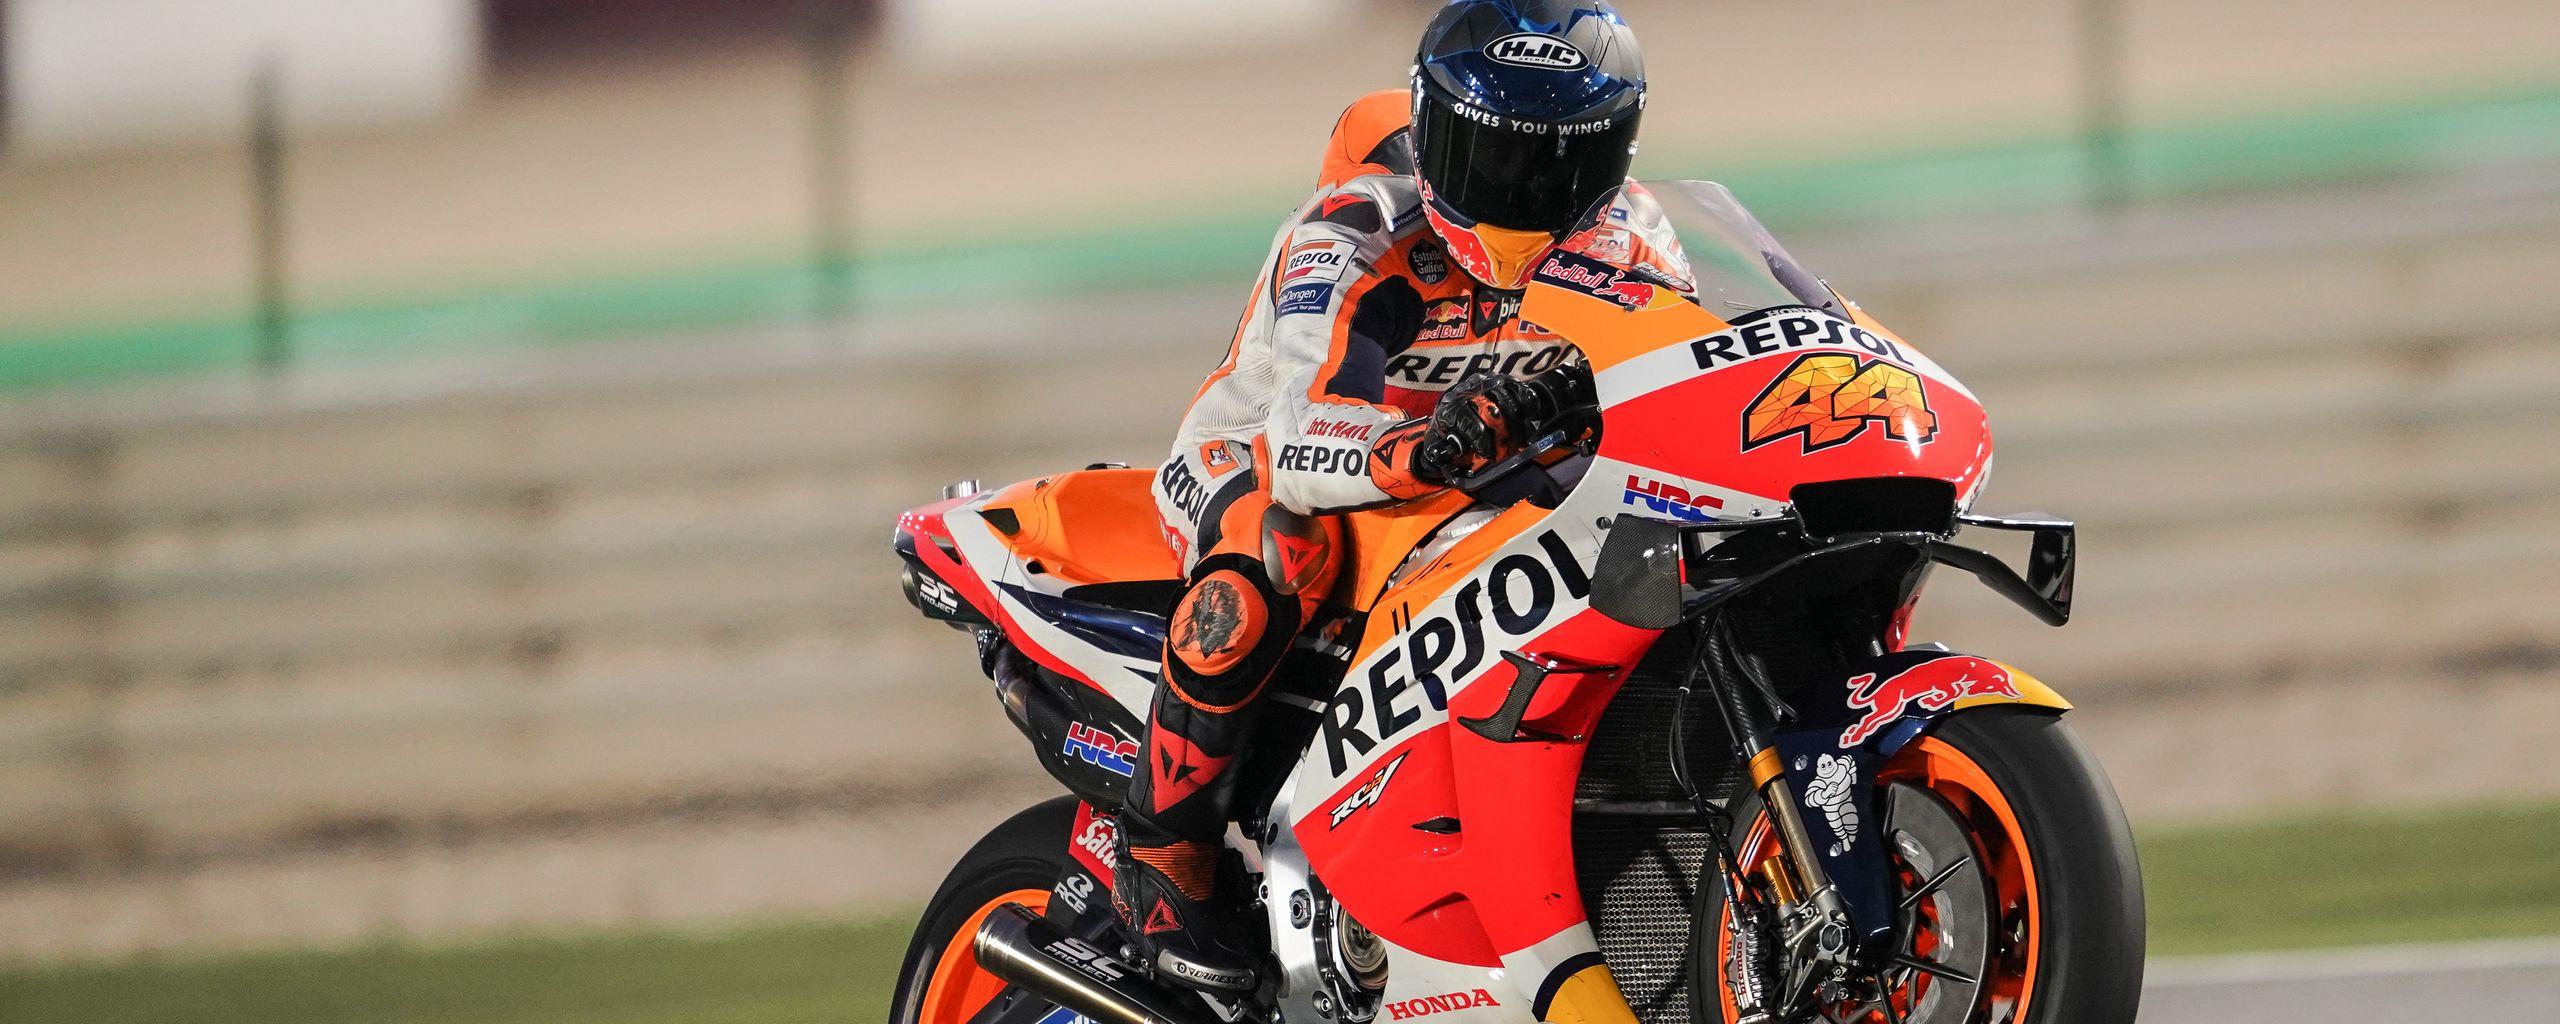 2560x1024 Wallpaper honda, motorcycle, motorcyclist, helmet, speed, track, orange